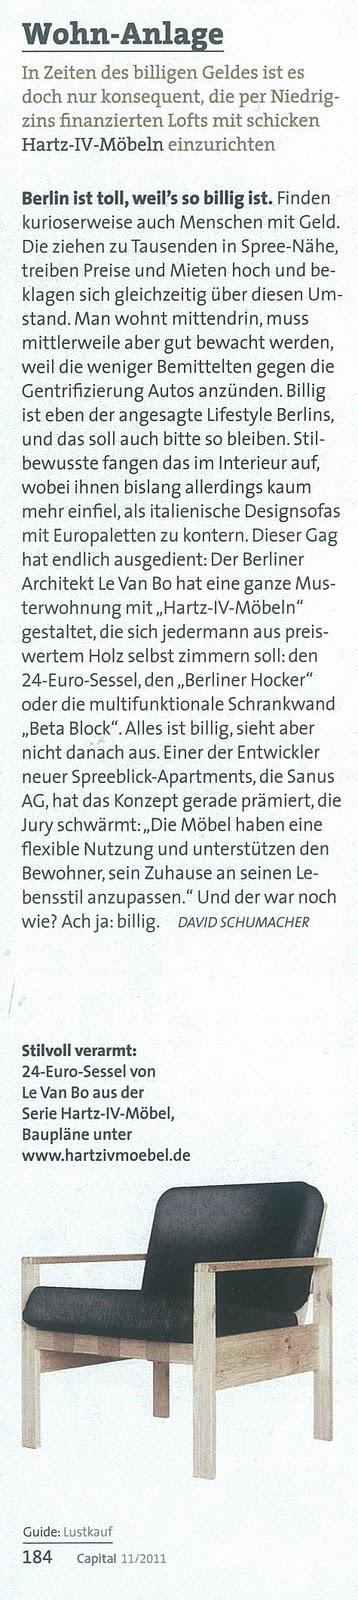 Hartz IV Möbel: Presse